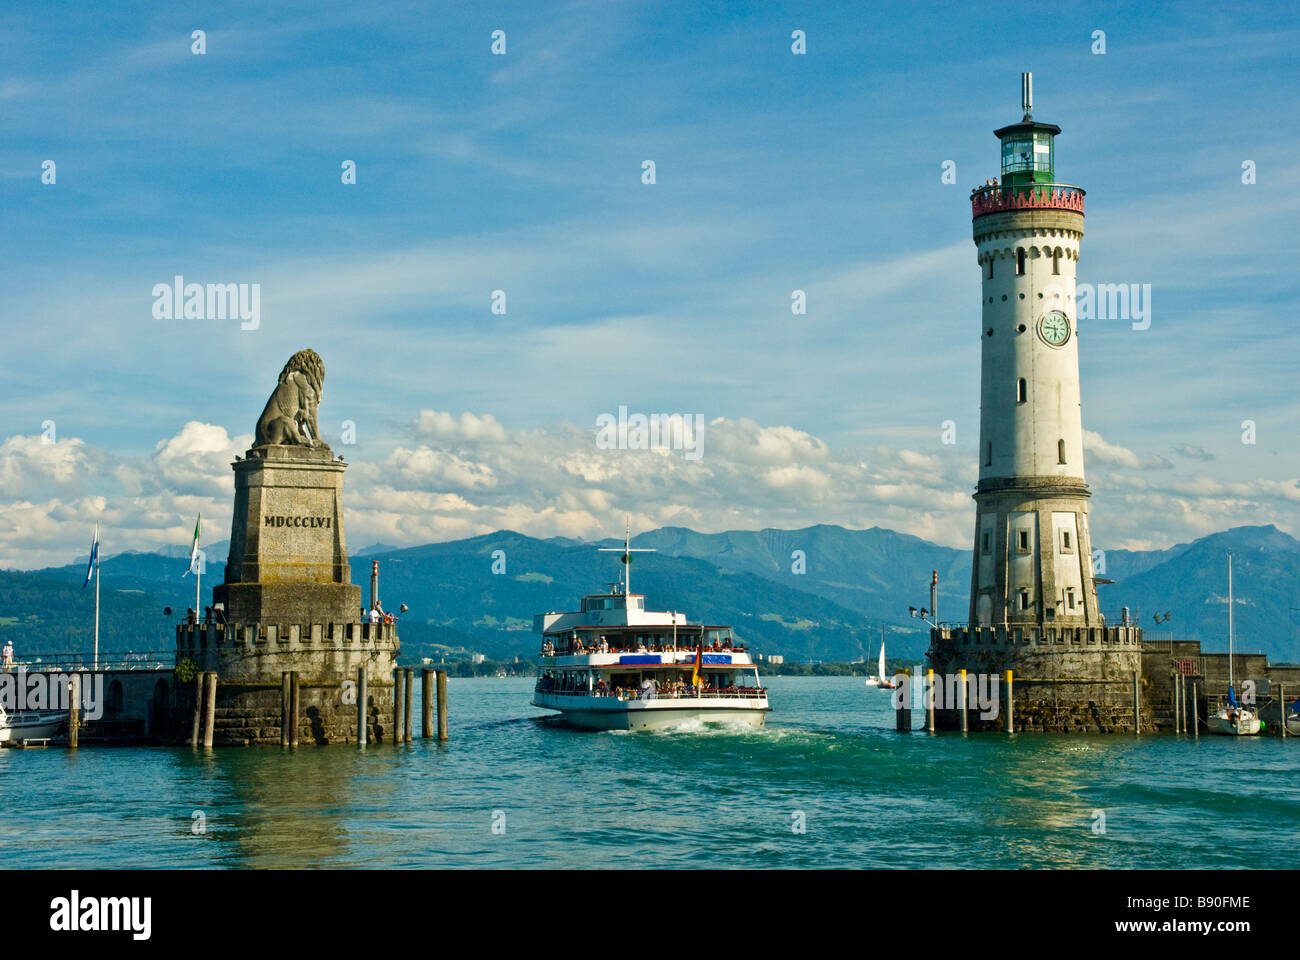 Lindau harbor entrance looking at swiss alp panorama Lake Constance Germany | Passagierschiff in der Hafeneinfahrt Stock Photo